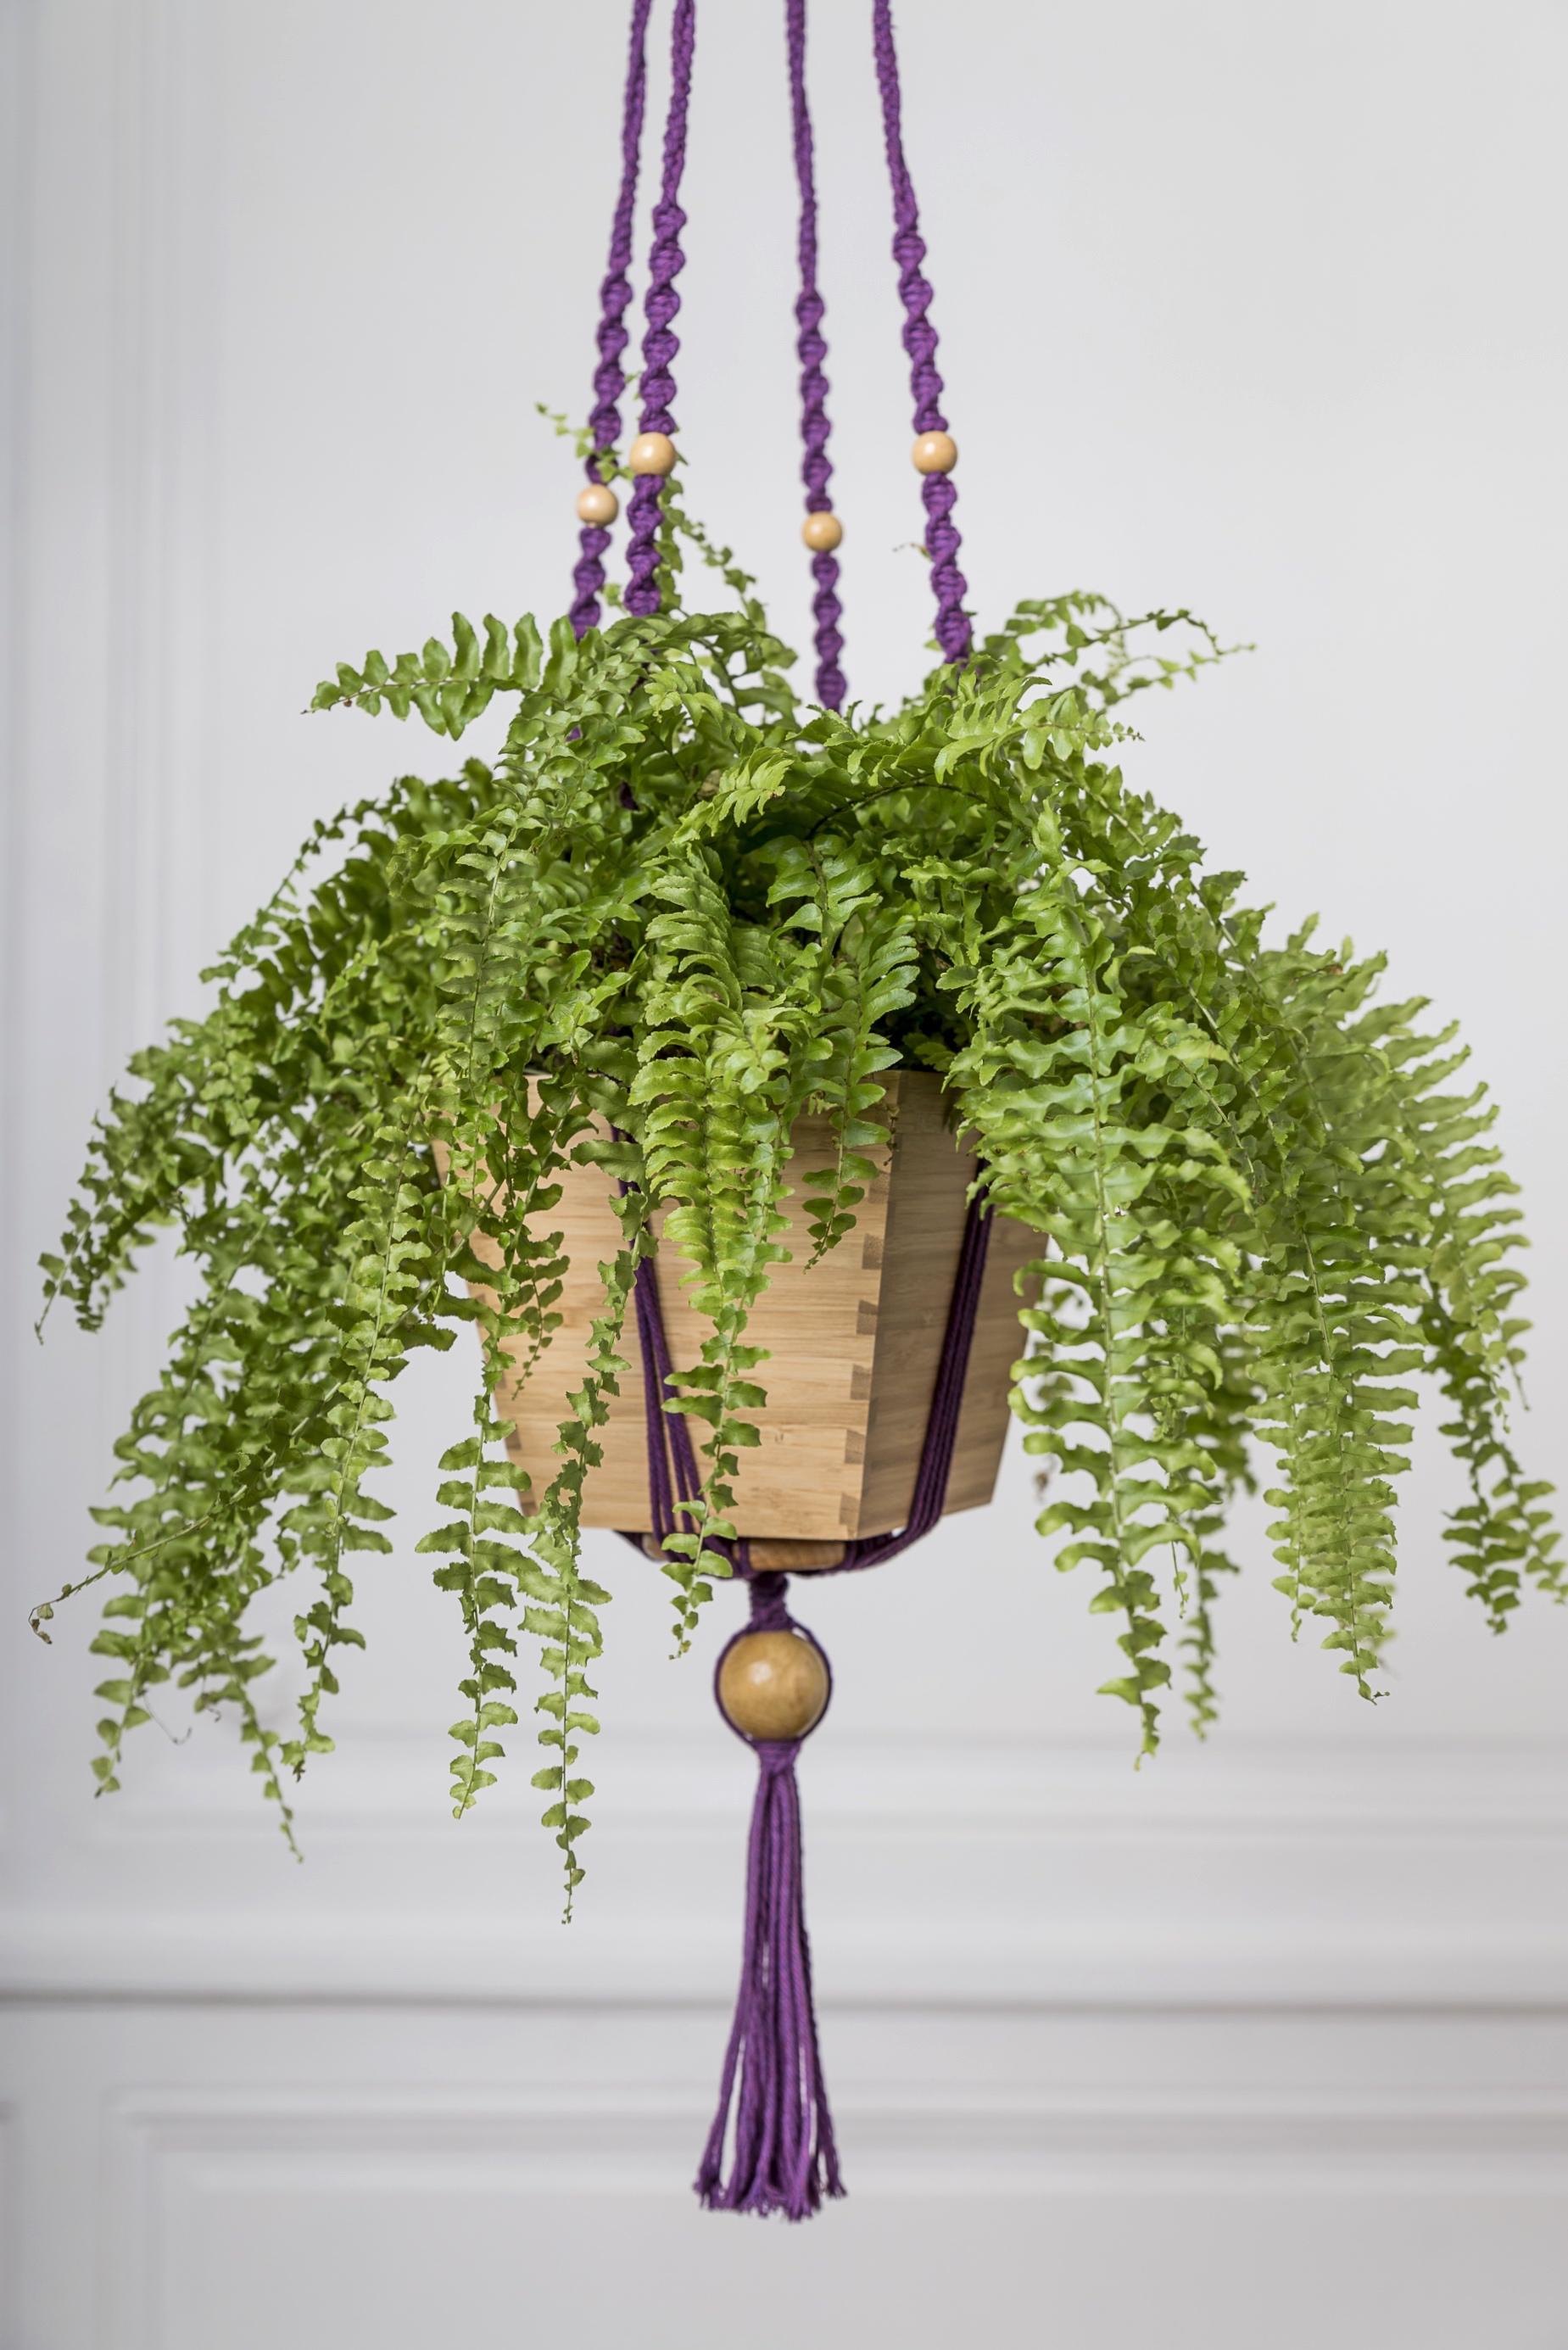 suspension pour plante en macram bymadjo tynka d co. Black Bedroom Furniture Sets. Home Design Ideas